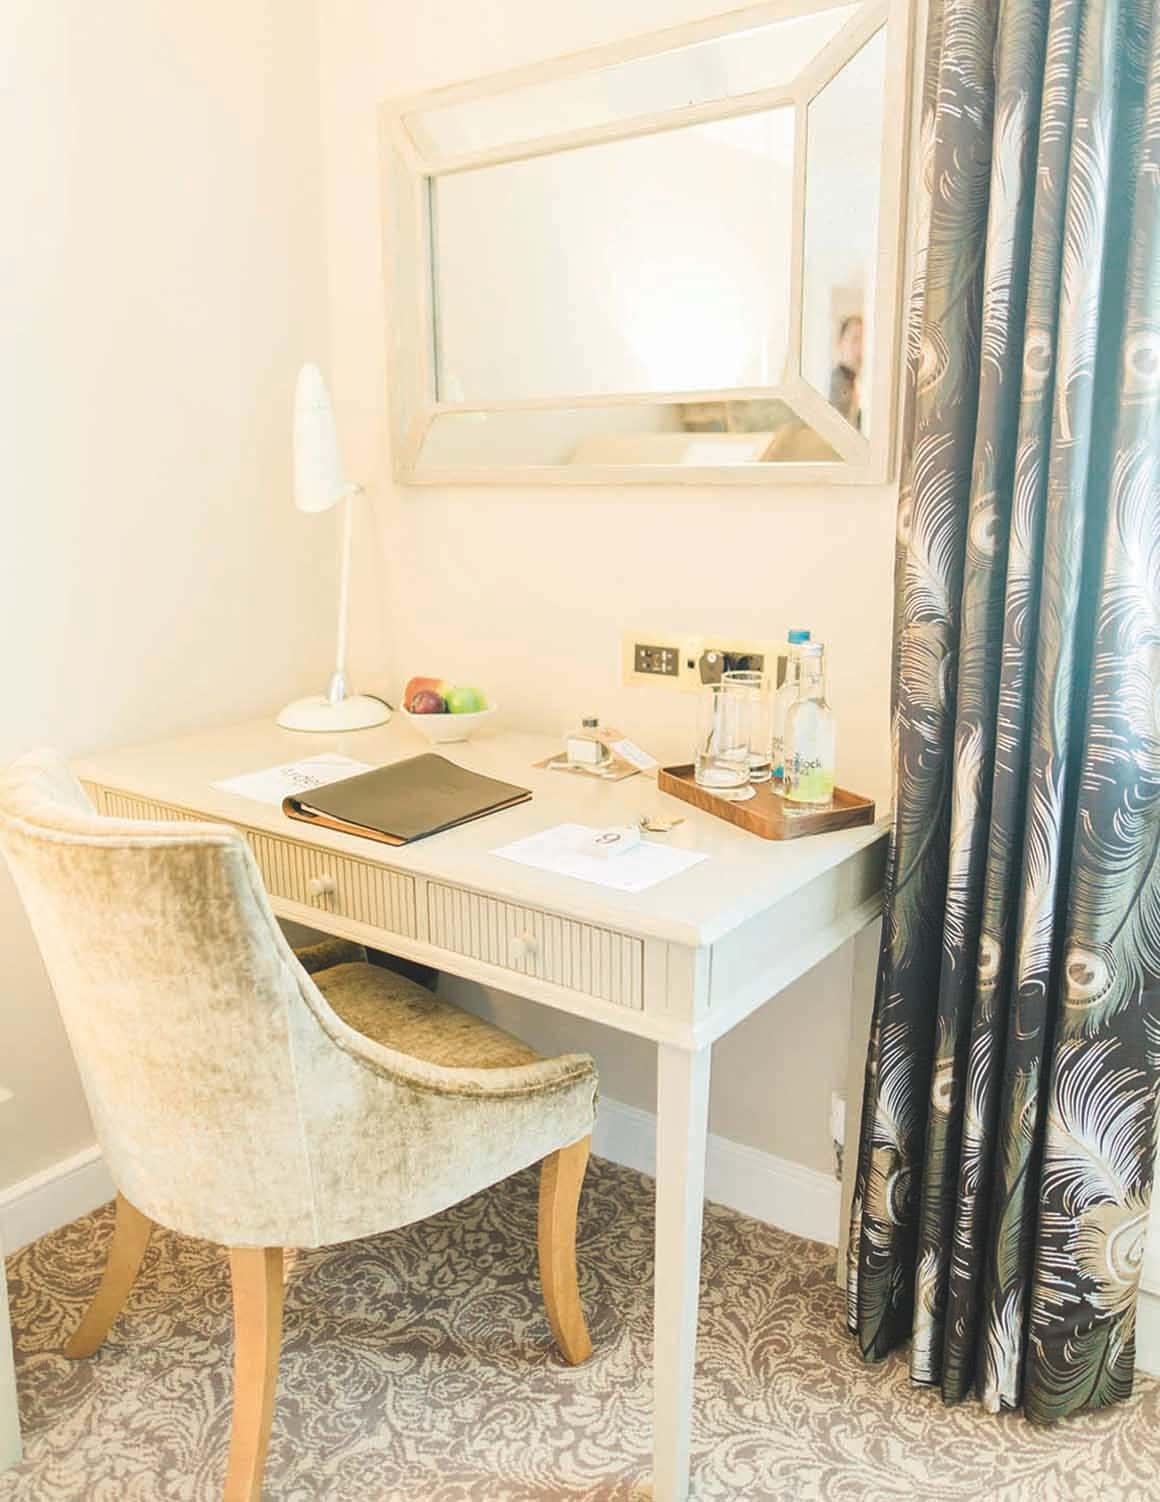 Arden House Hotel Photo Gallery desk in bedroom